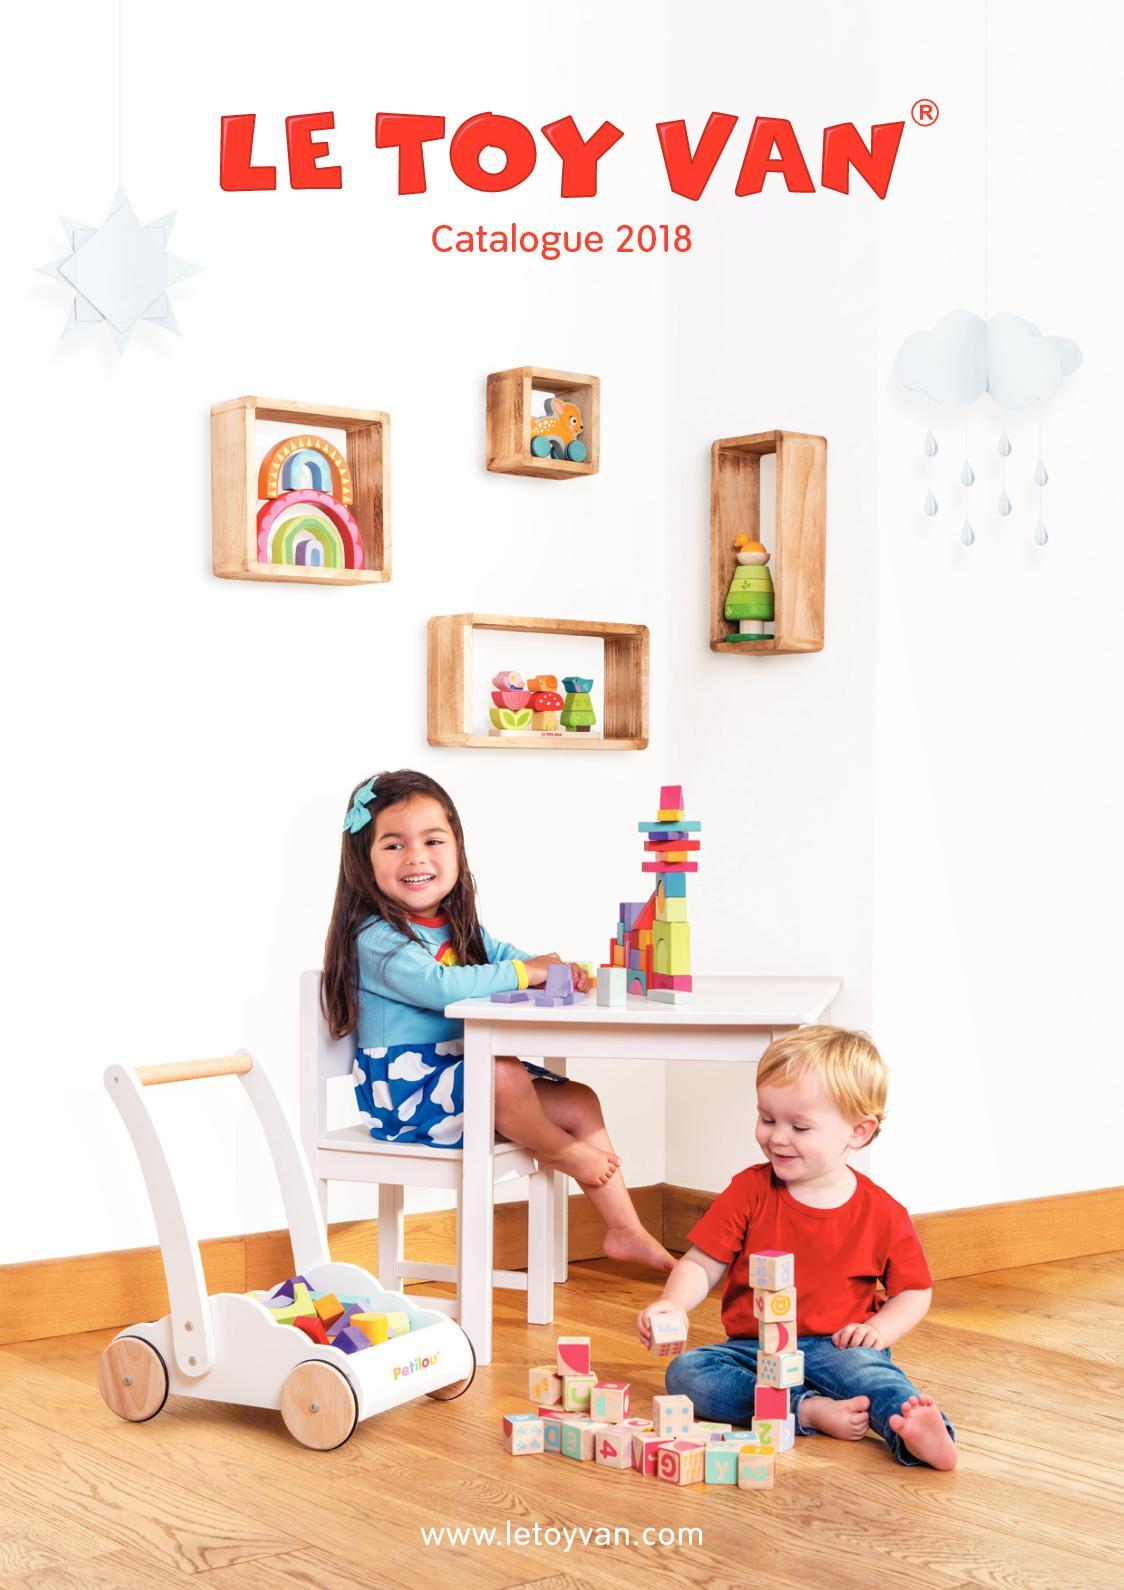 Le Toy Van Catalogue 2018